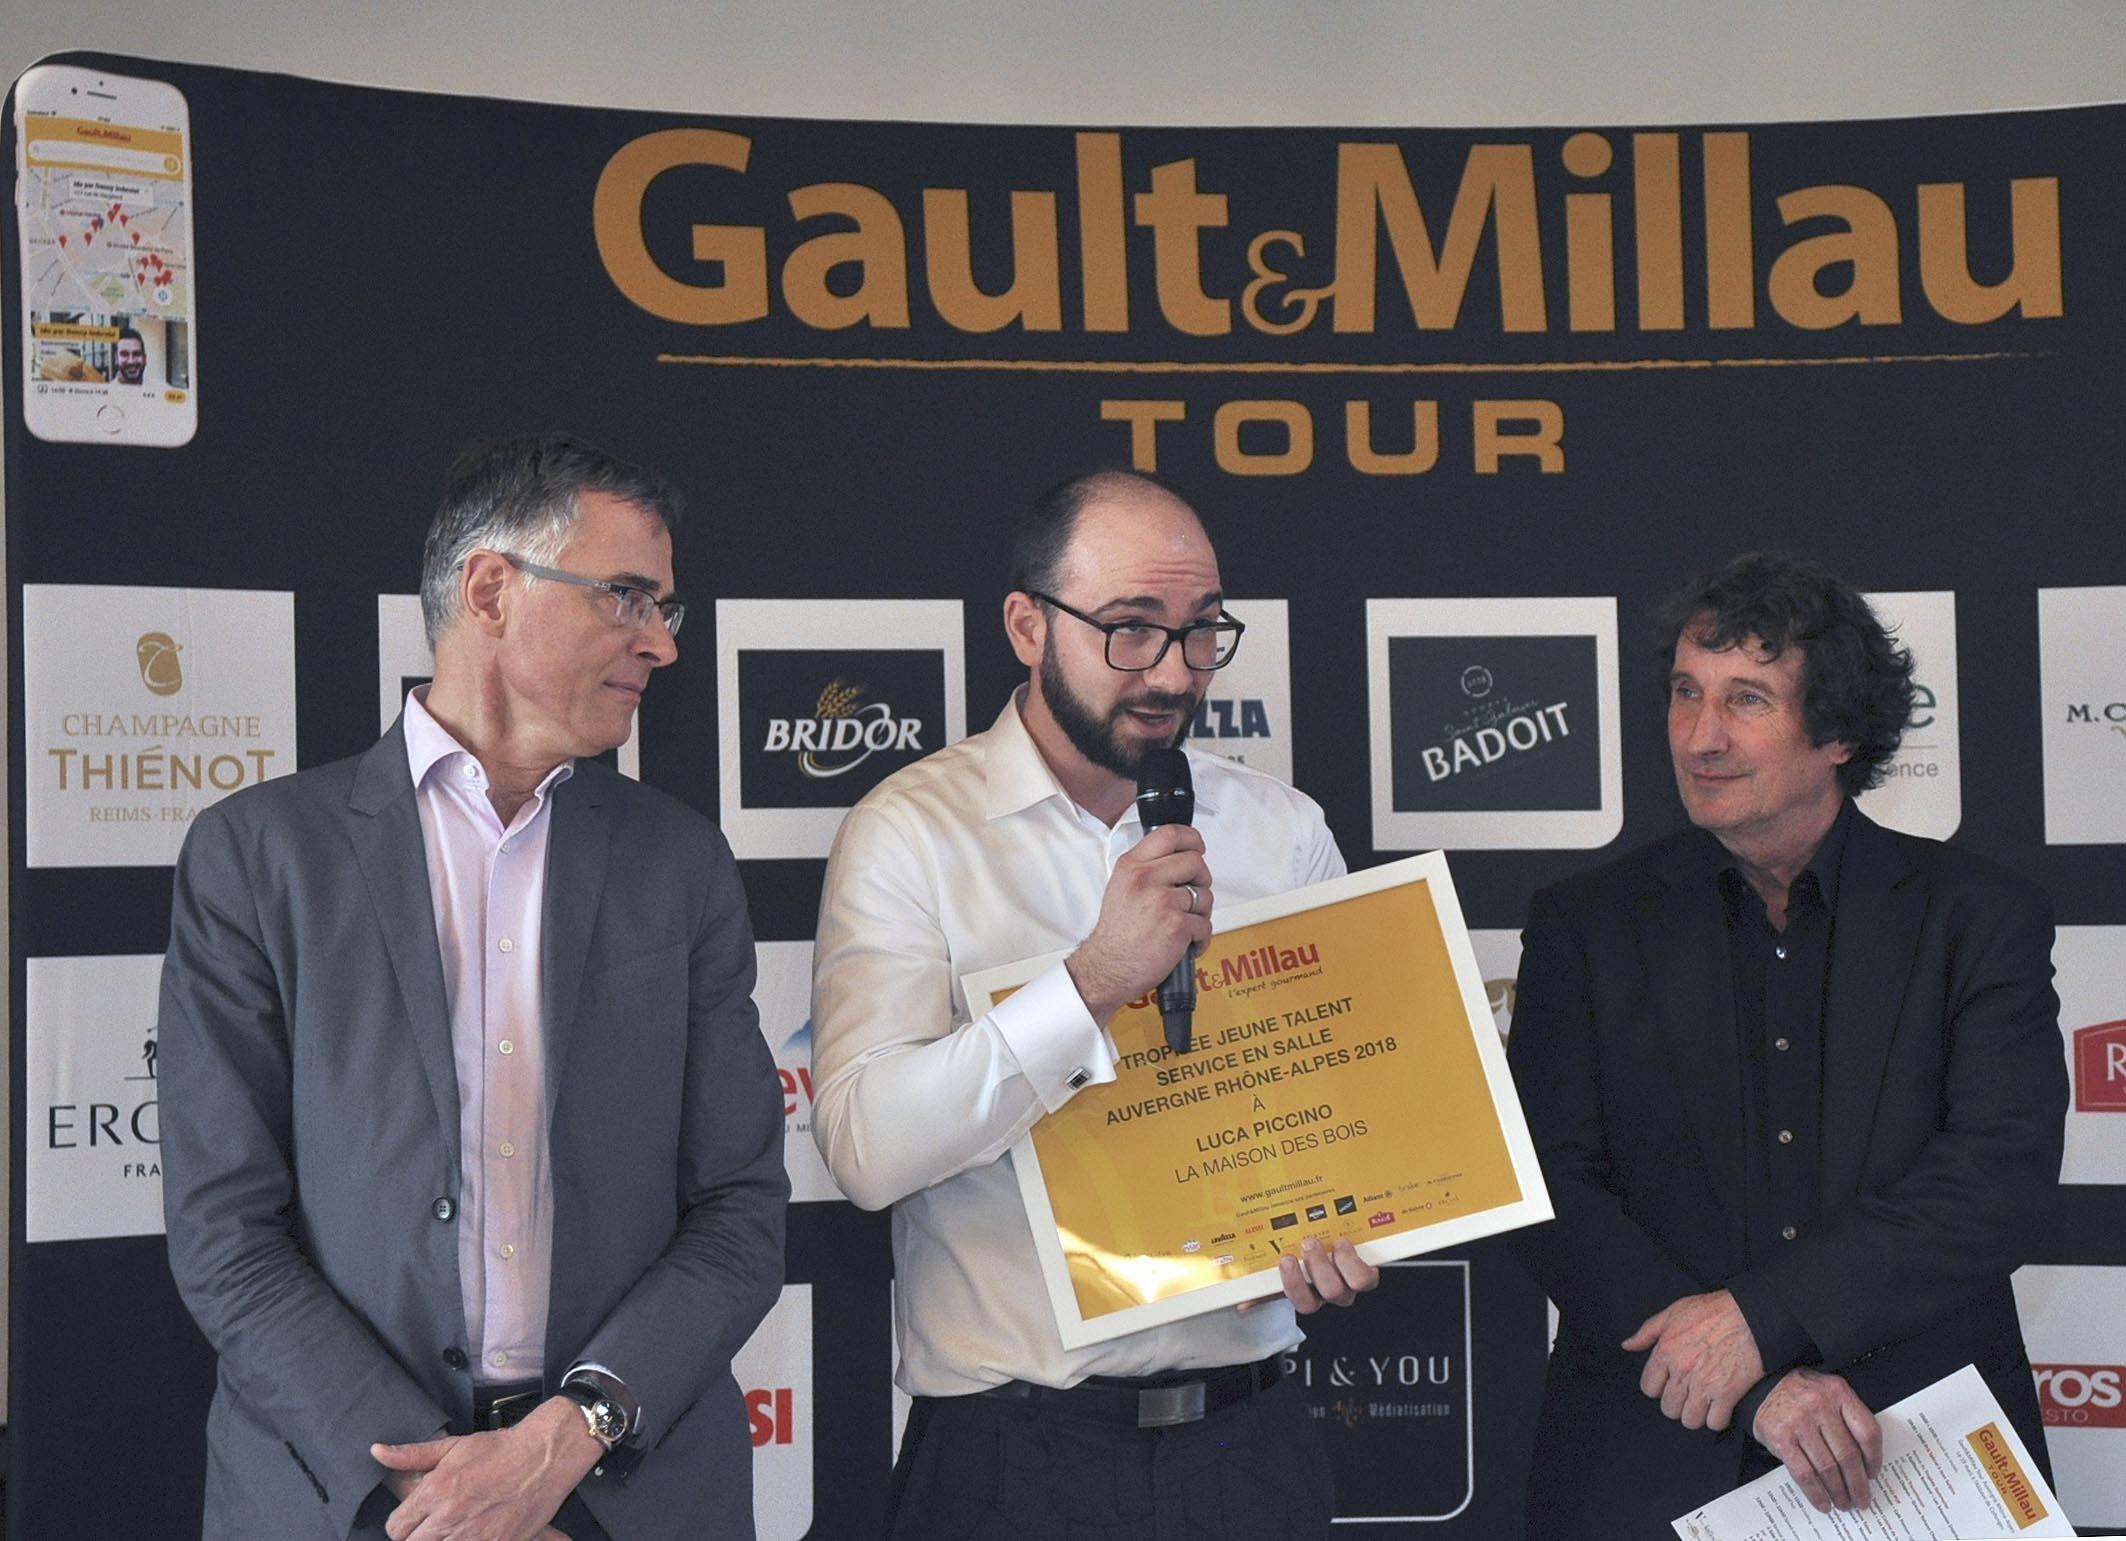 Gault&Millau Tour 2018 ©Godet_0170